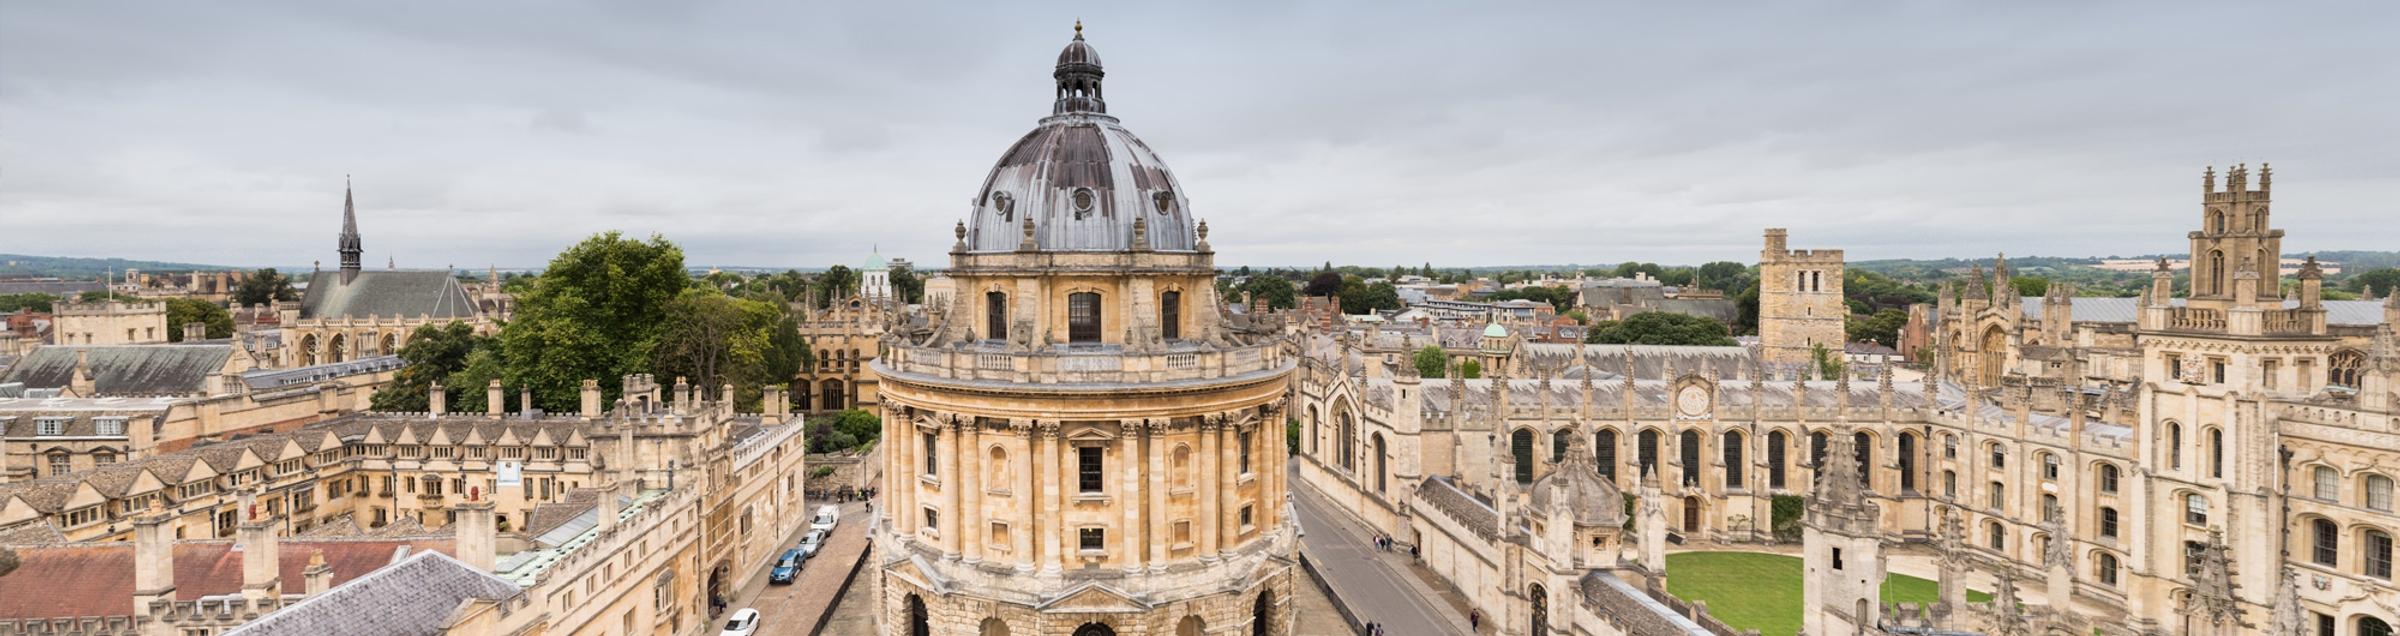 Oxford University Museum of Natural History & Pitt Rivers Museum